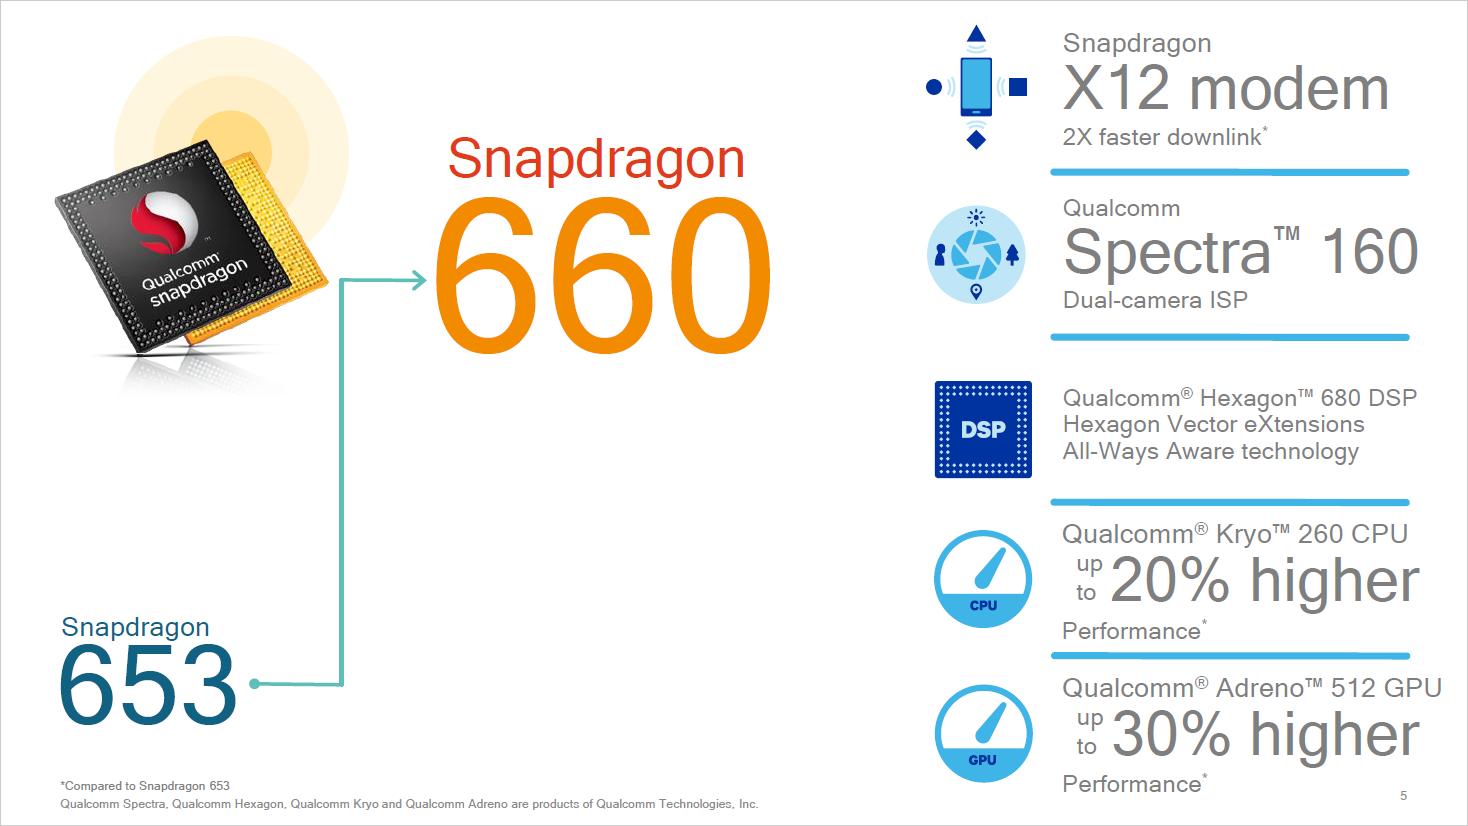 Snapdragon 660/630: Qualcomm bringt Kryo-Kerne in die Mittelklasse - SD660 im Detail (Bild: Qualcomm)